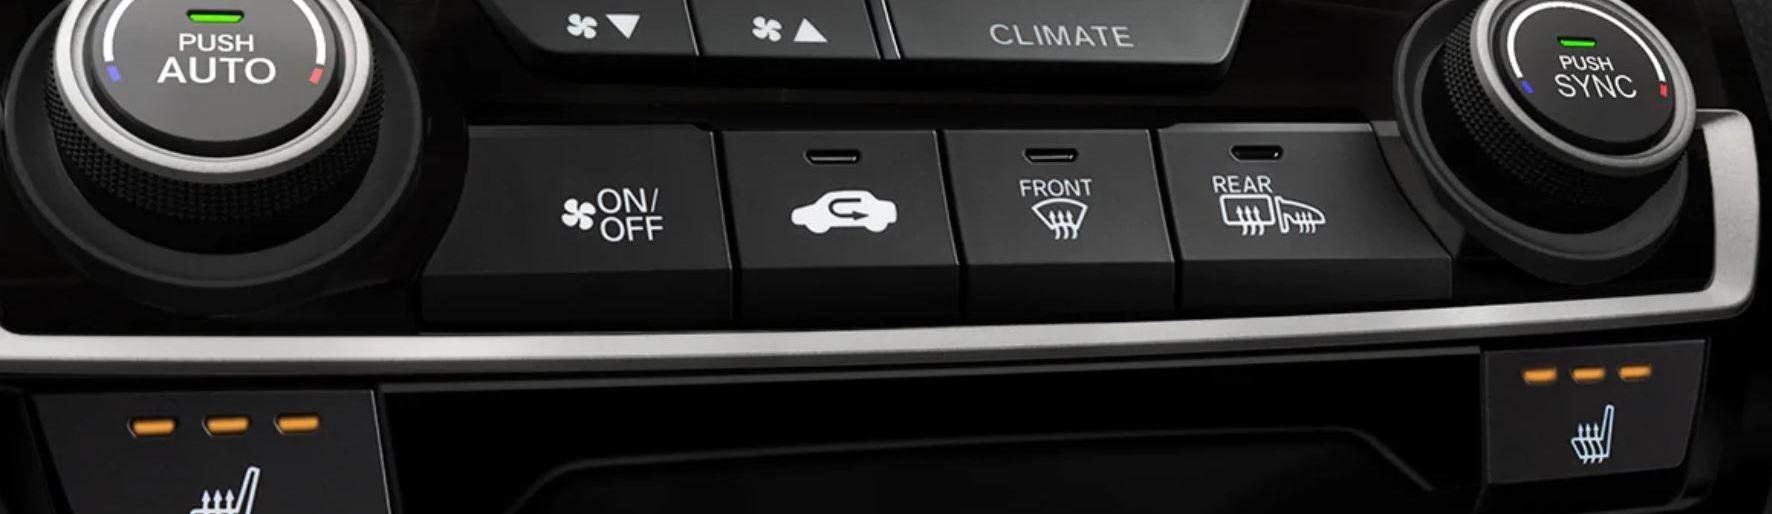 2020 Honda Civic Climate Control System